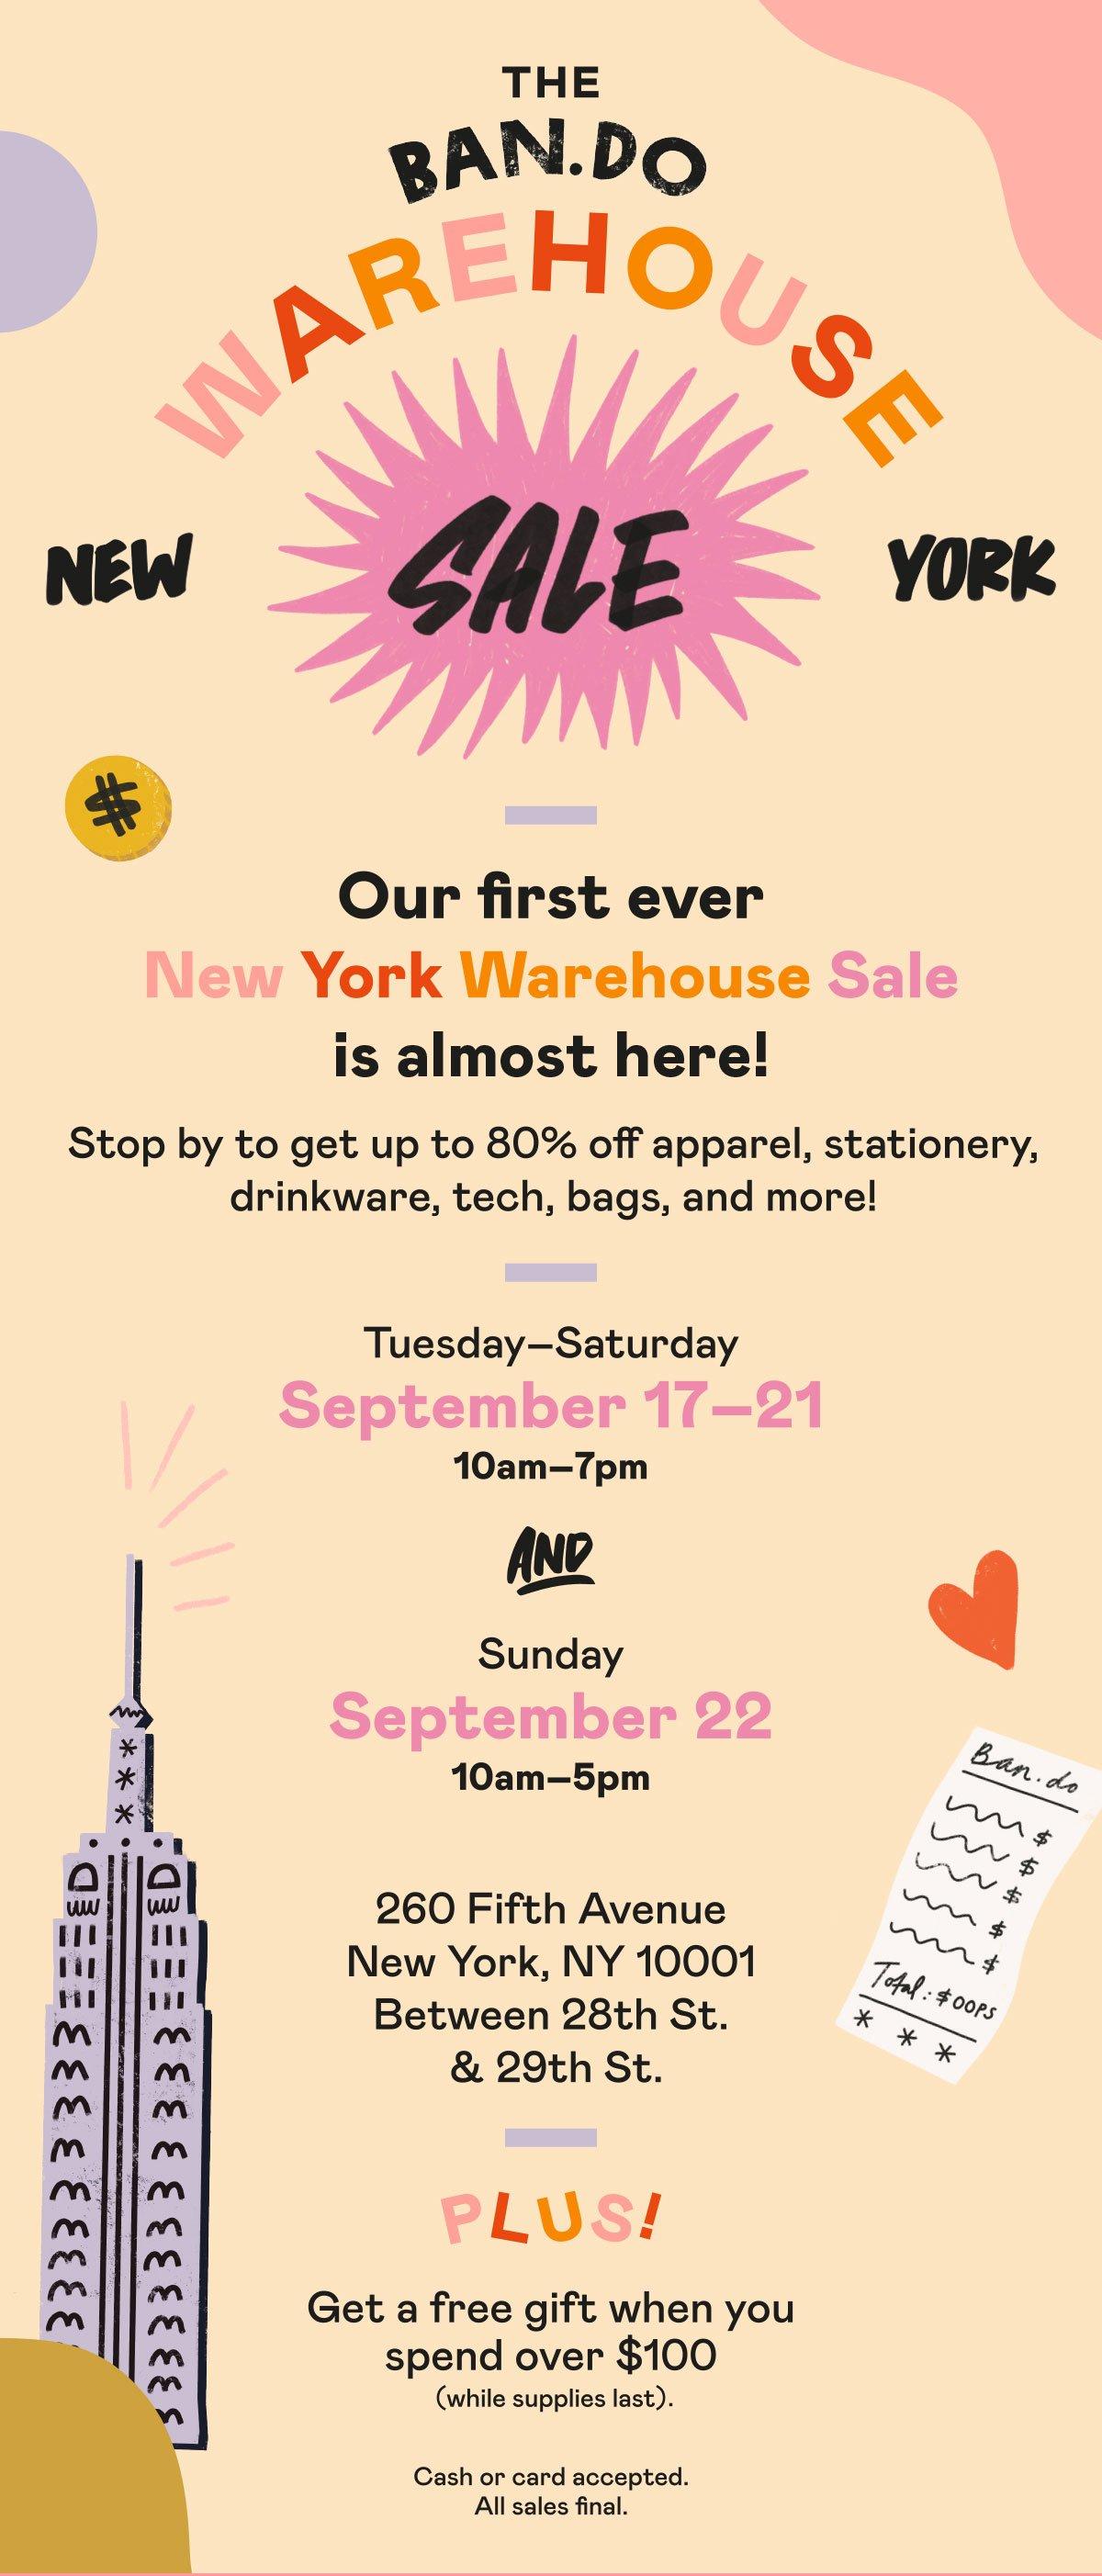 The ban.do New Work warehouse sale